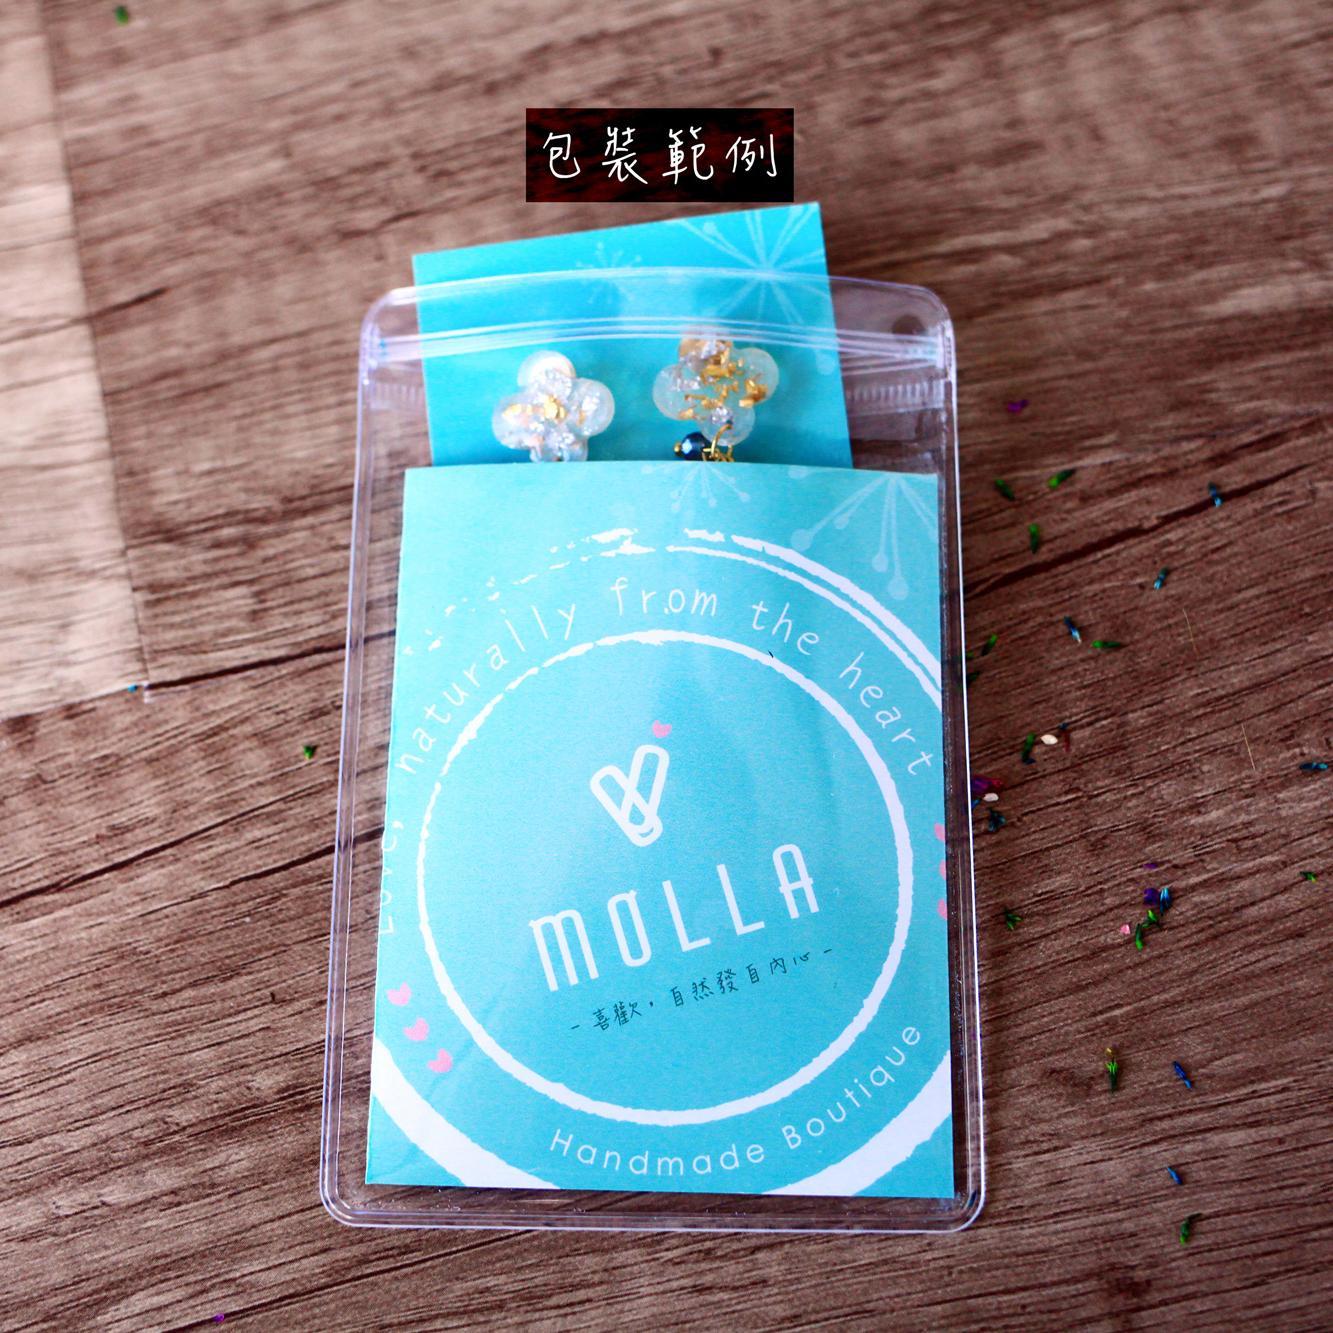 Molla 大圓婁空耳環-正藍(FLAMENCO佛朗明哥舞者最愛-純銀針手工訂製)